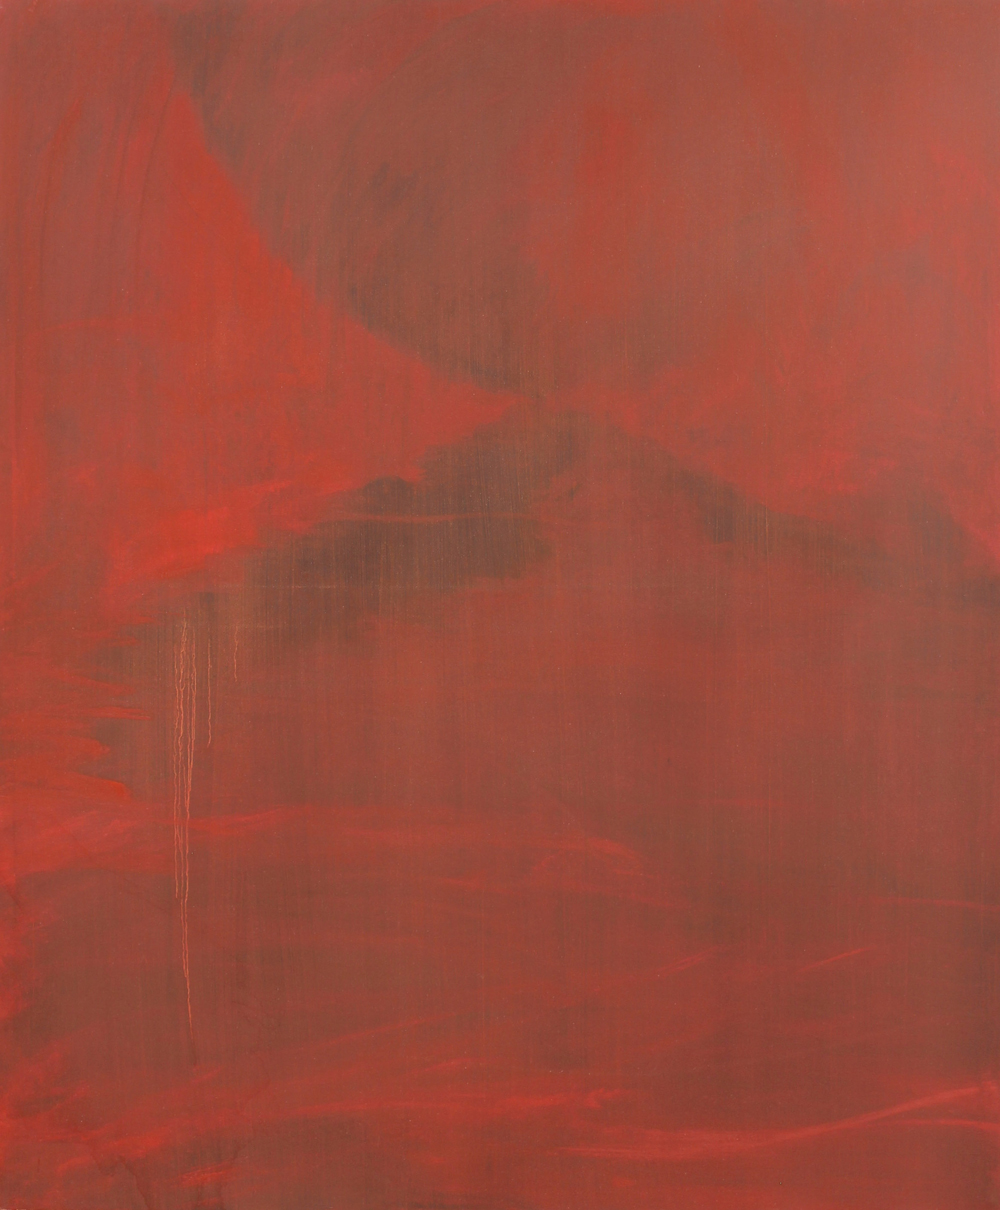 Gorge, 2015, oil on canvas, 120 x 100cm